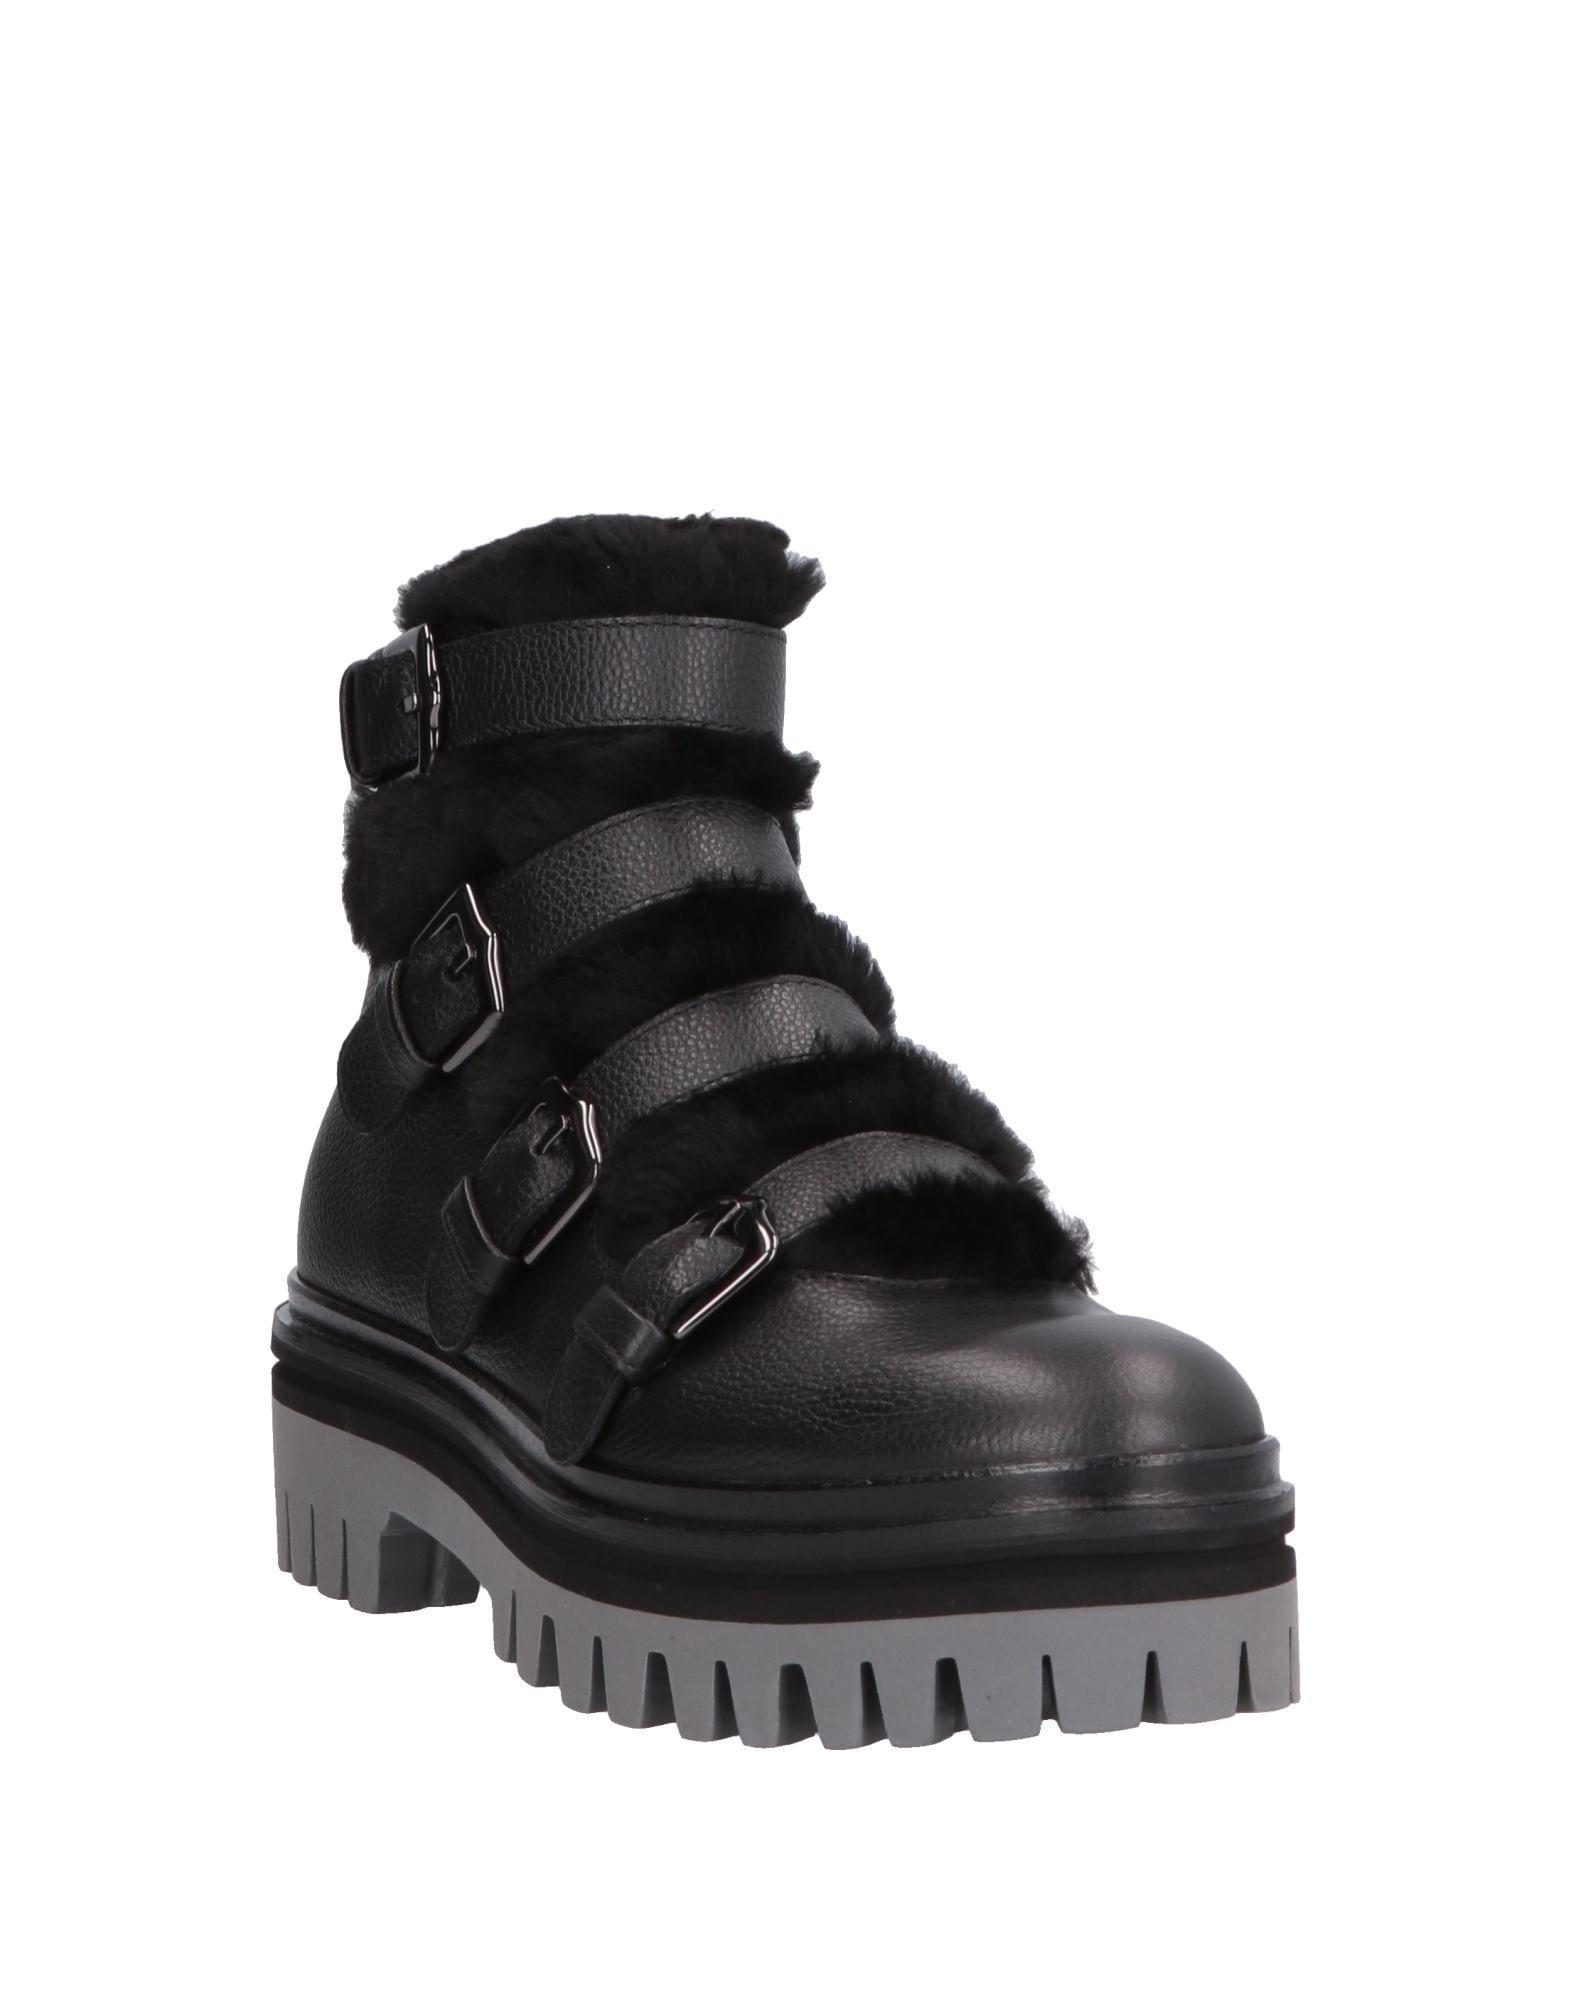 Rabatt Schuhe Alberto Guardiani  Stiefelette Damen  Guardiani 11563794LG 5d2194